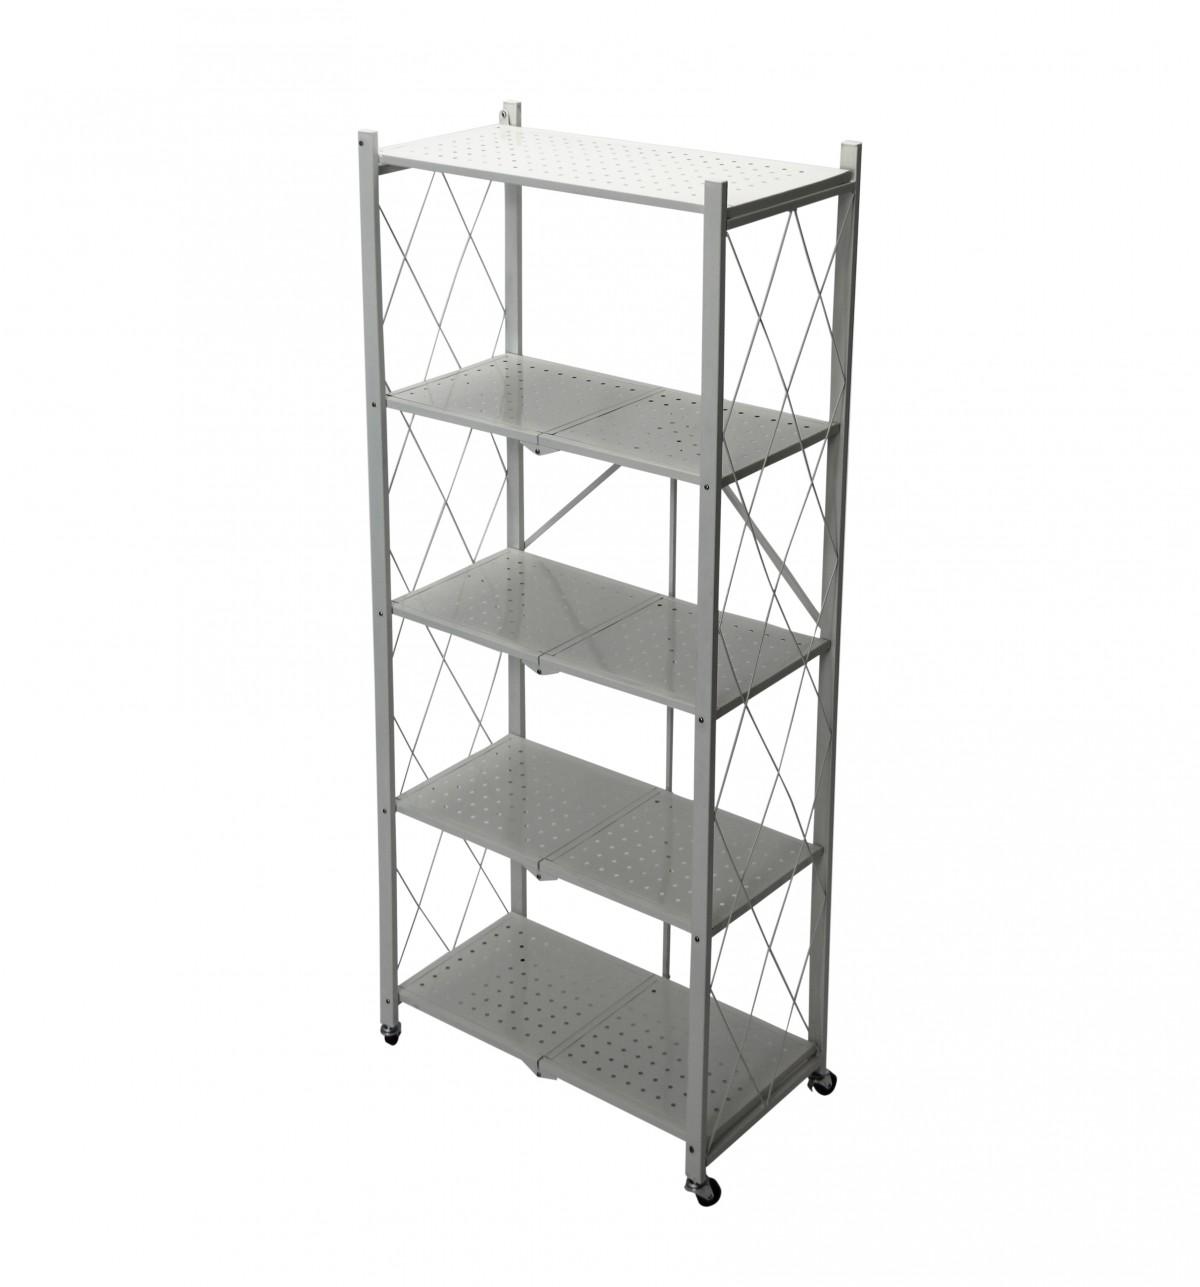 Fine Living Foldable Storage Rack-White Metal 5 La